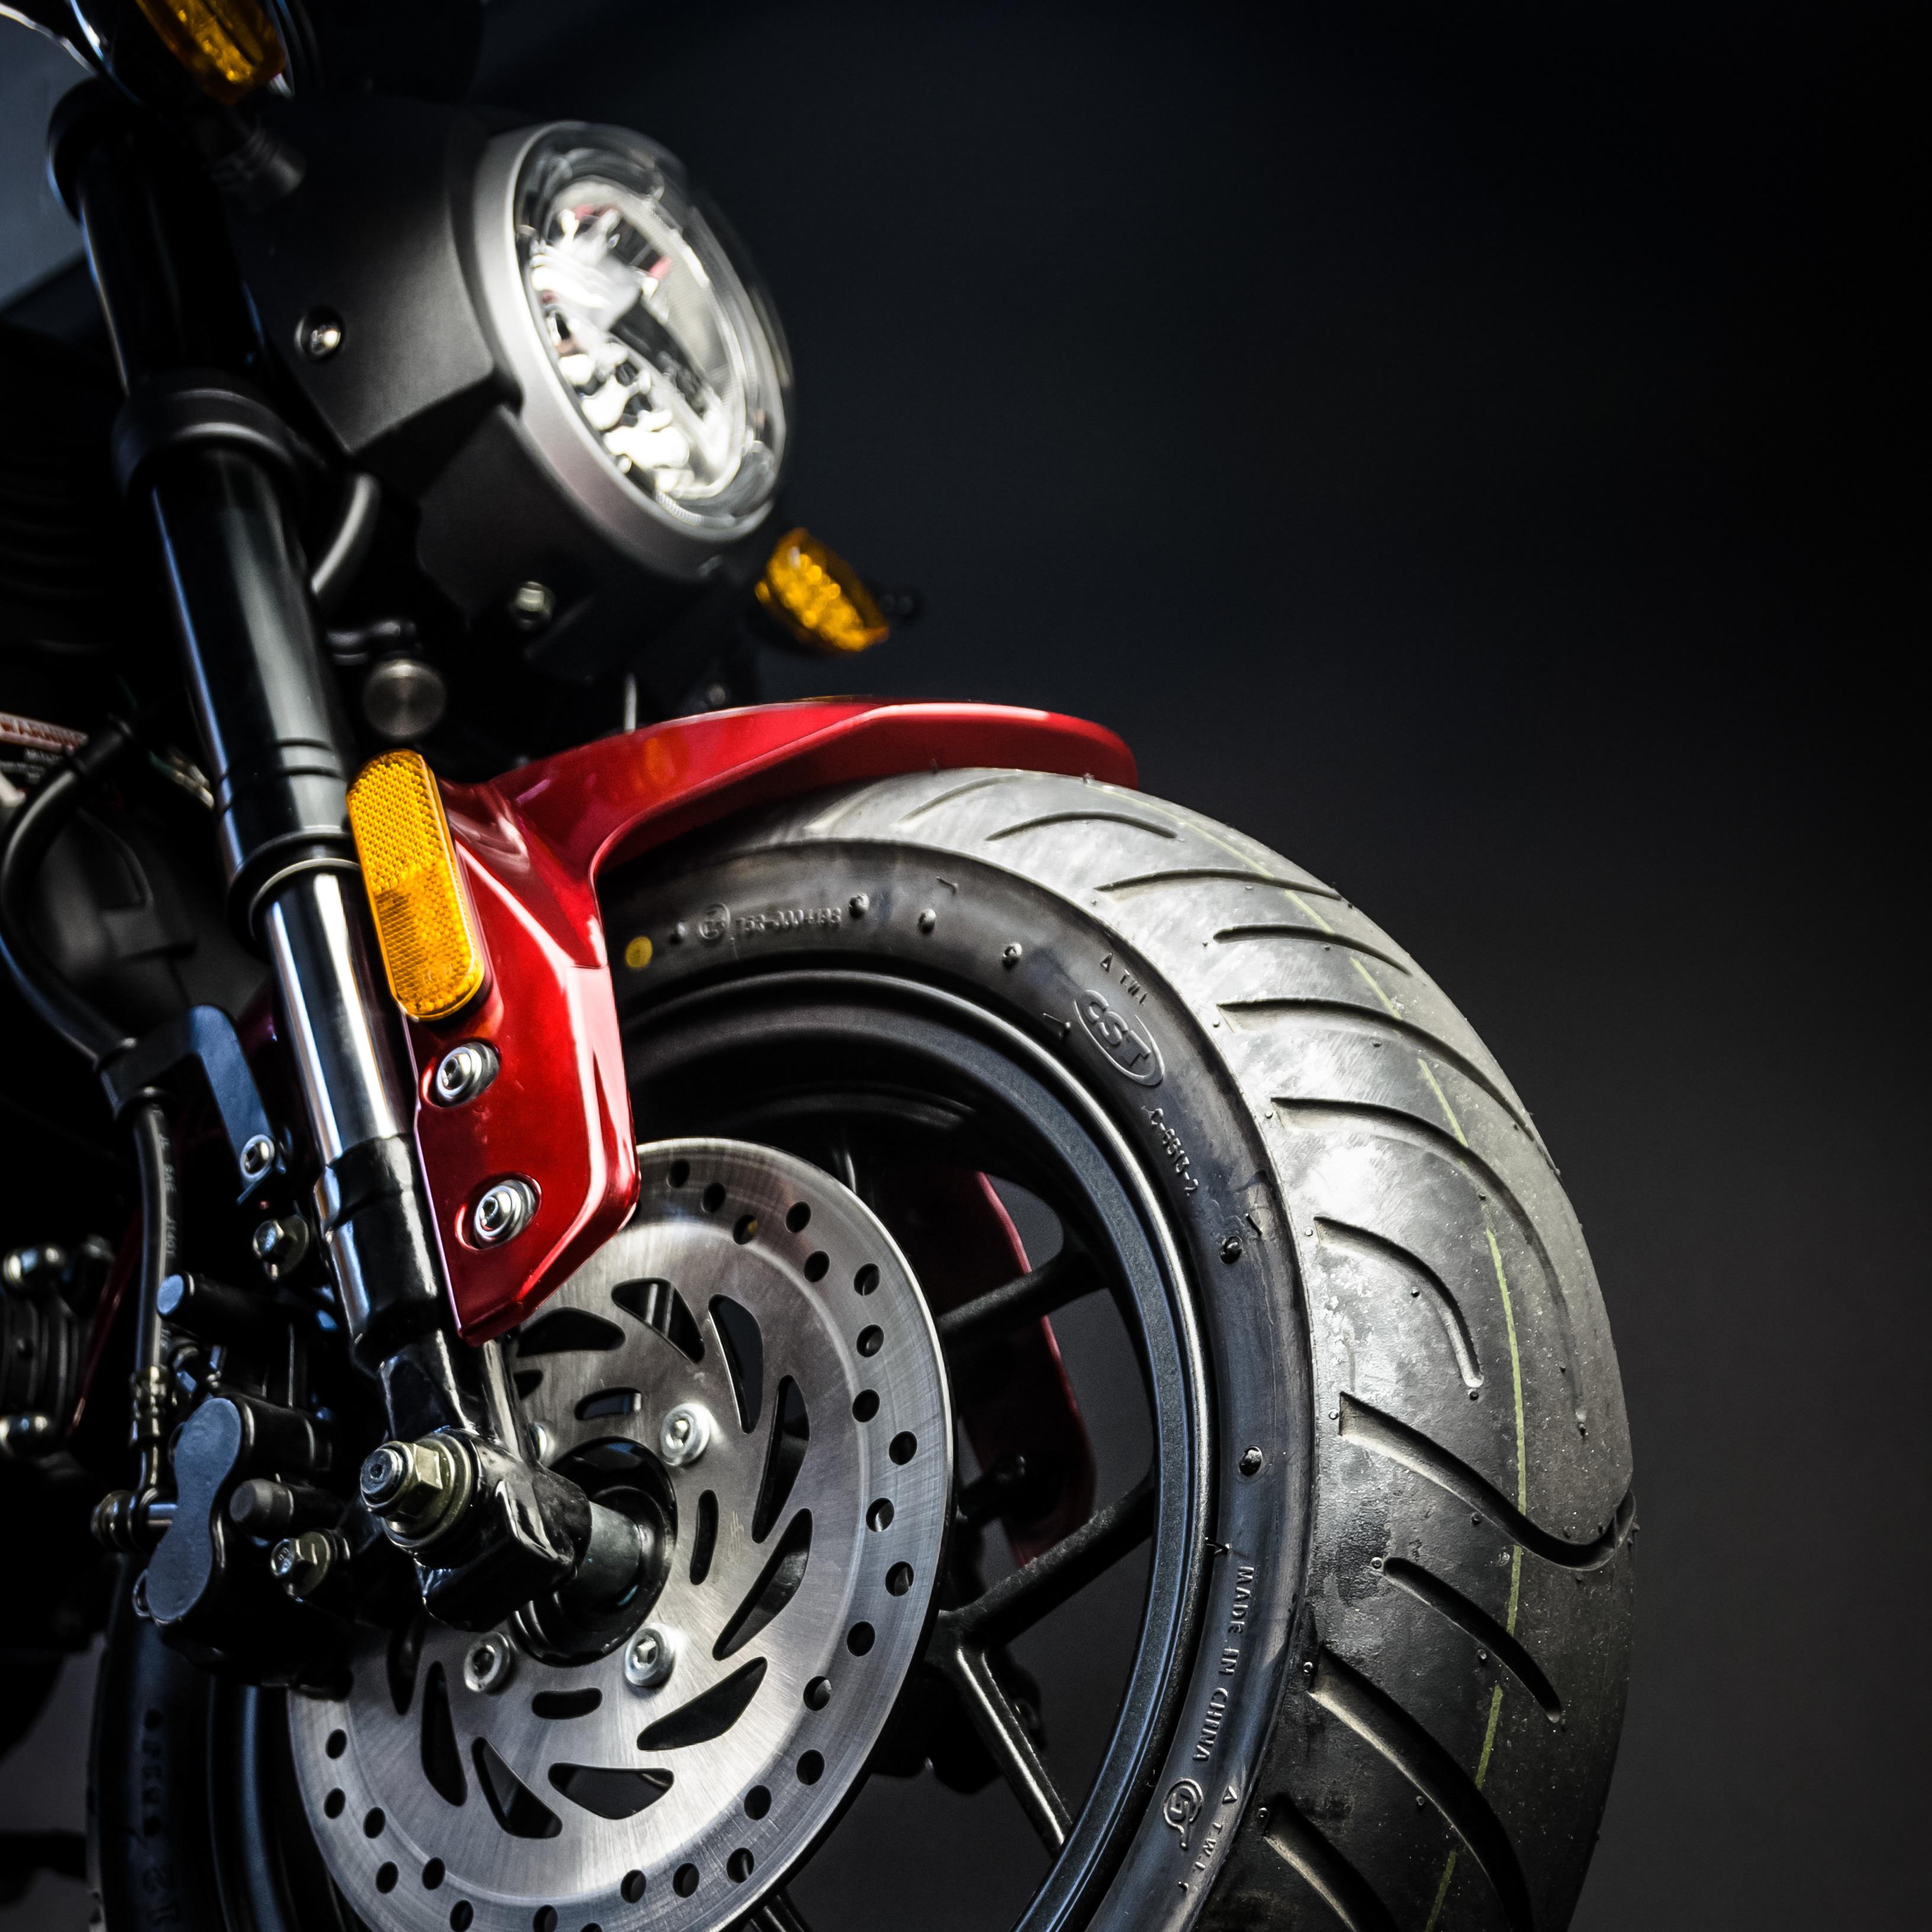 Versal Photography Motrac Motorcycles